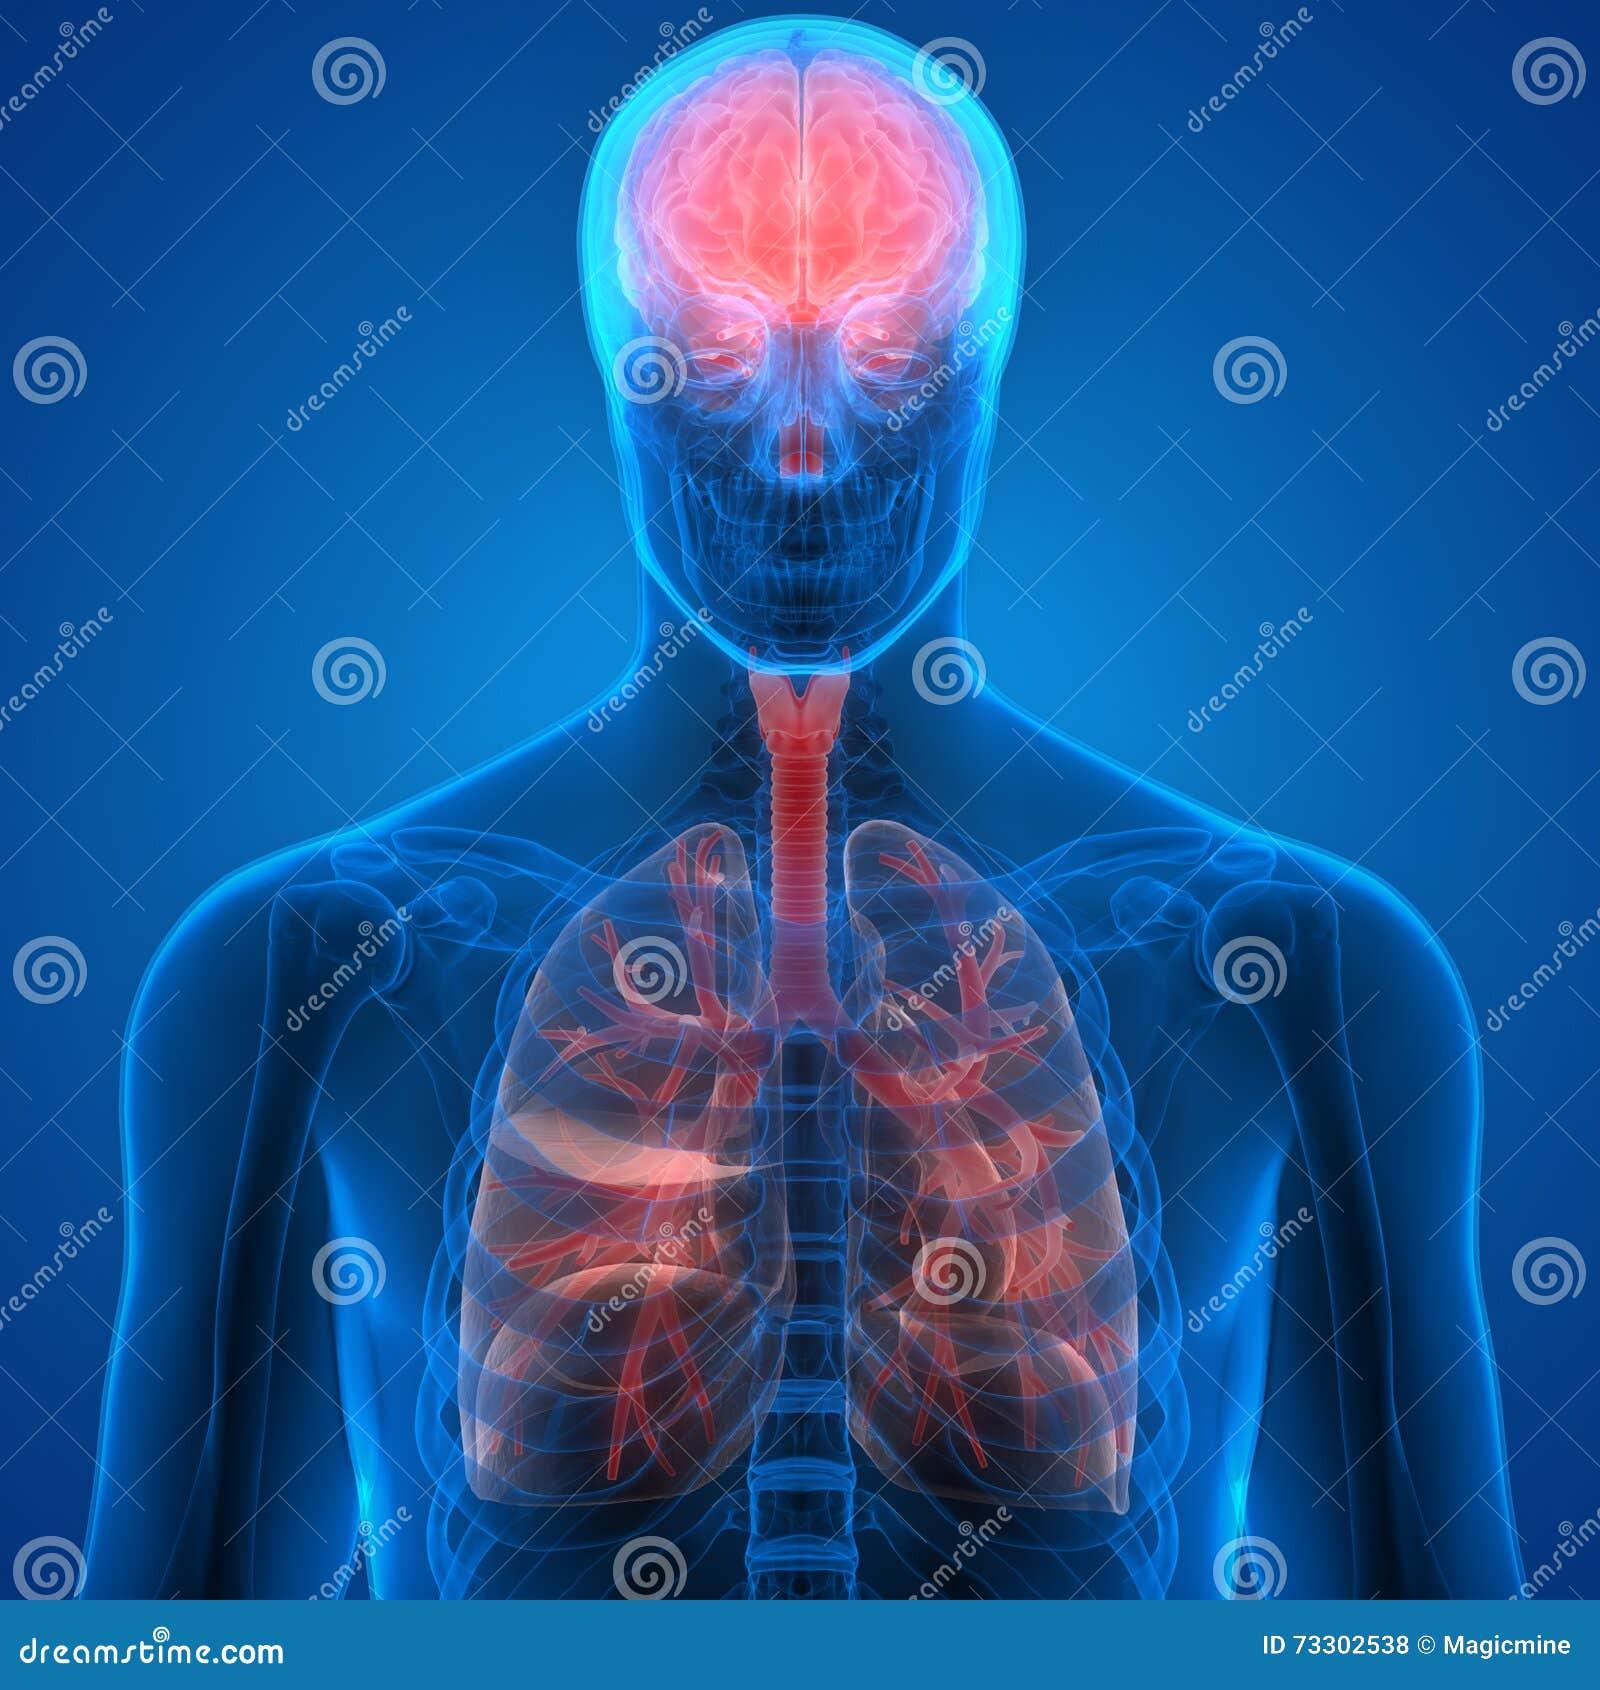 Excelente Diagrama De Colocación De órganos Humanos Regalo ...